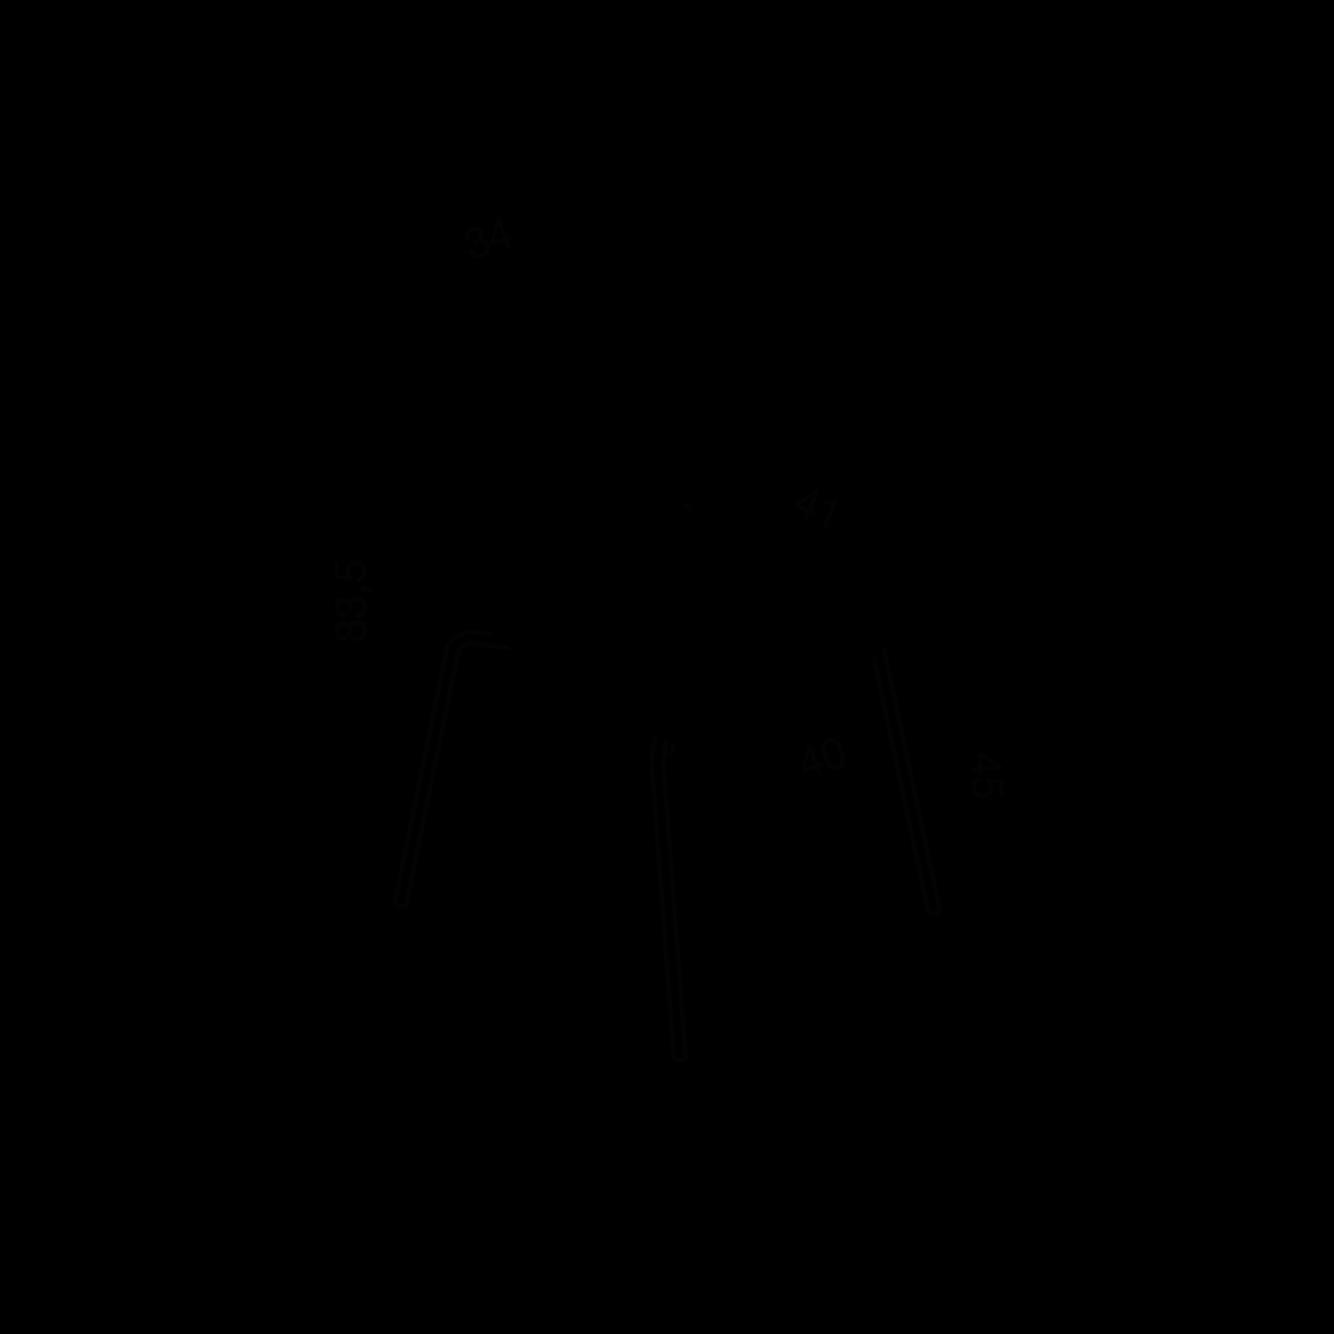 OBJ_Thin_4_Legs-01.png